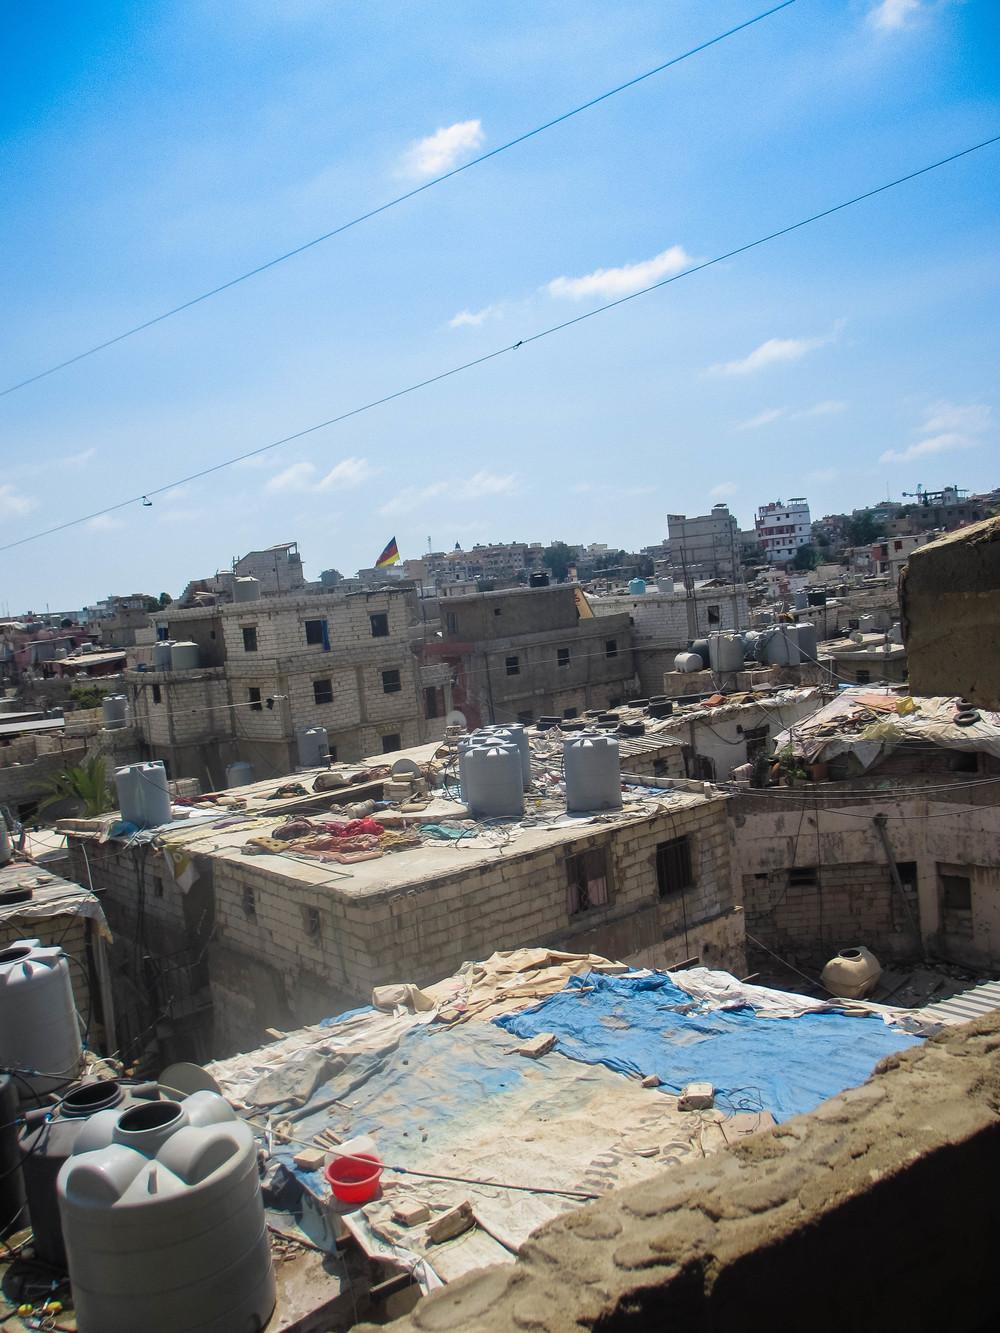 Shatila refugee camp, Beirut, Lebanon.